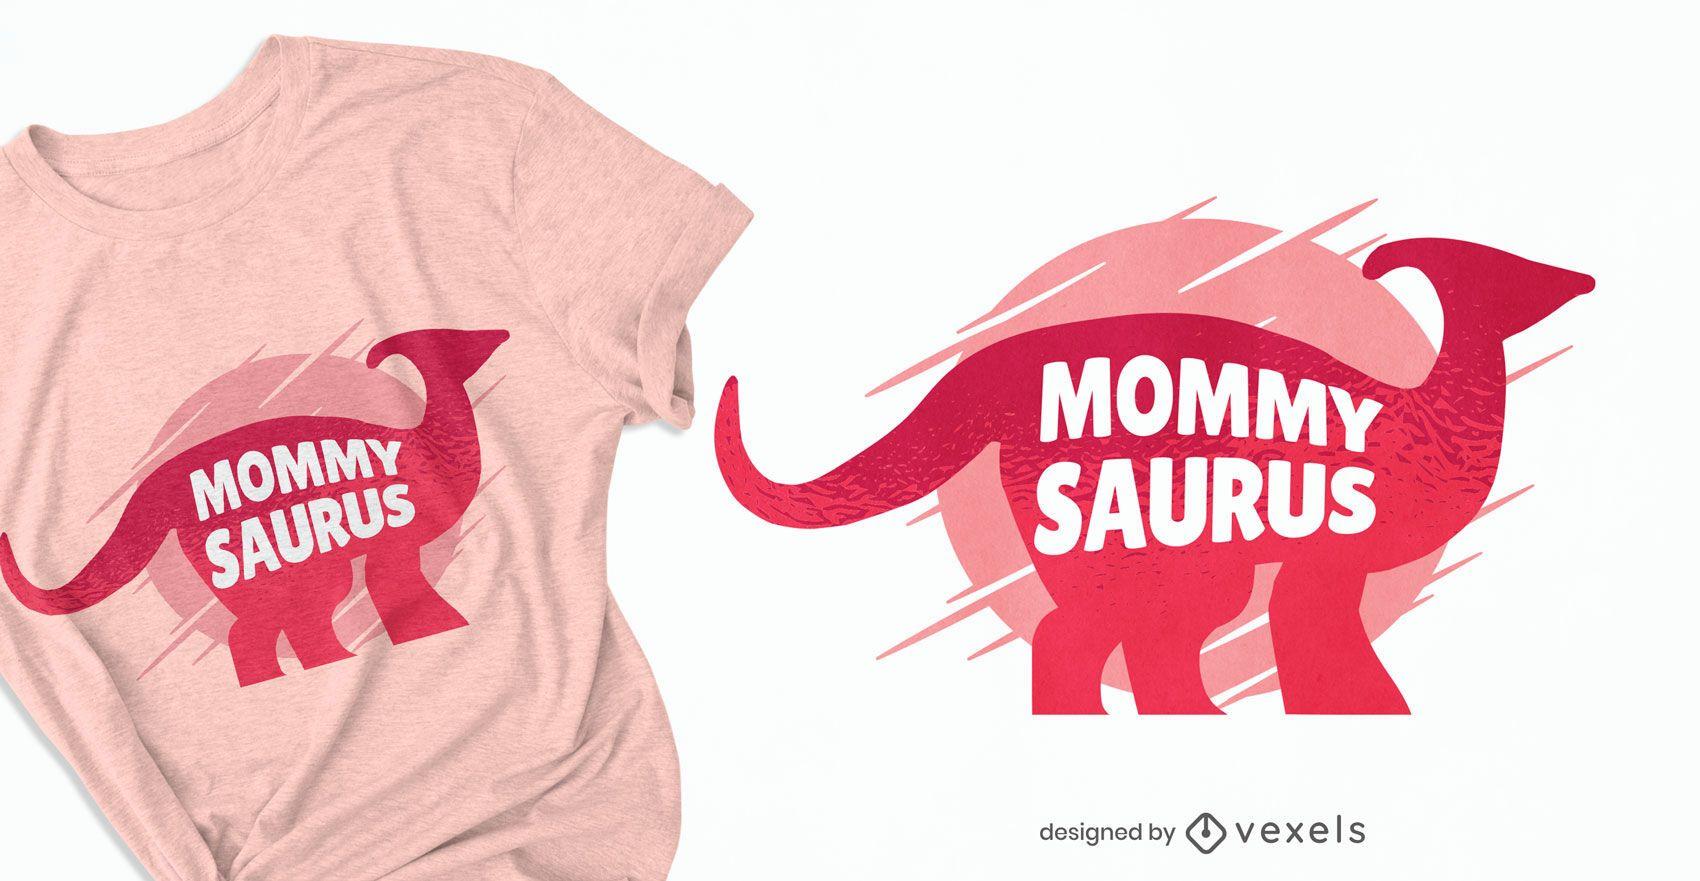 Mommysaurus t-shirt design